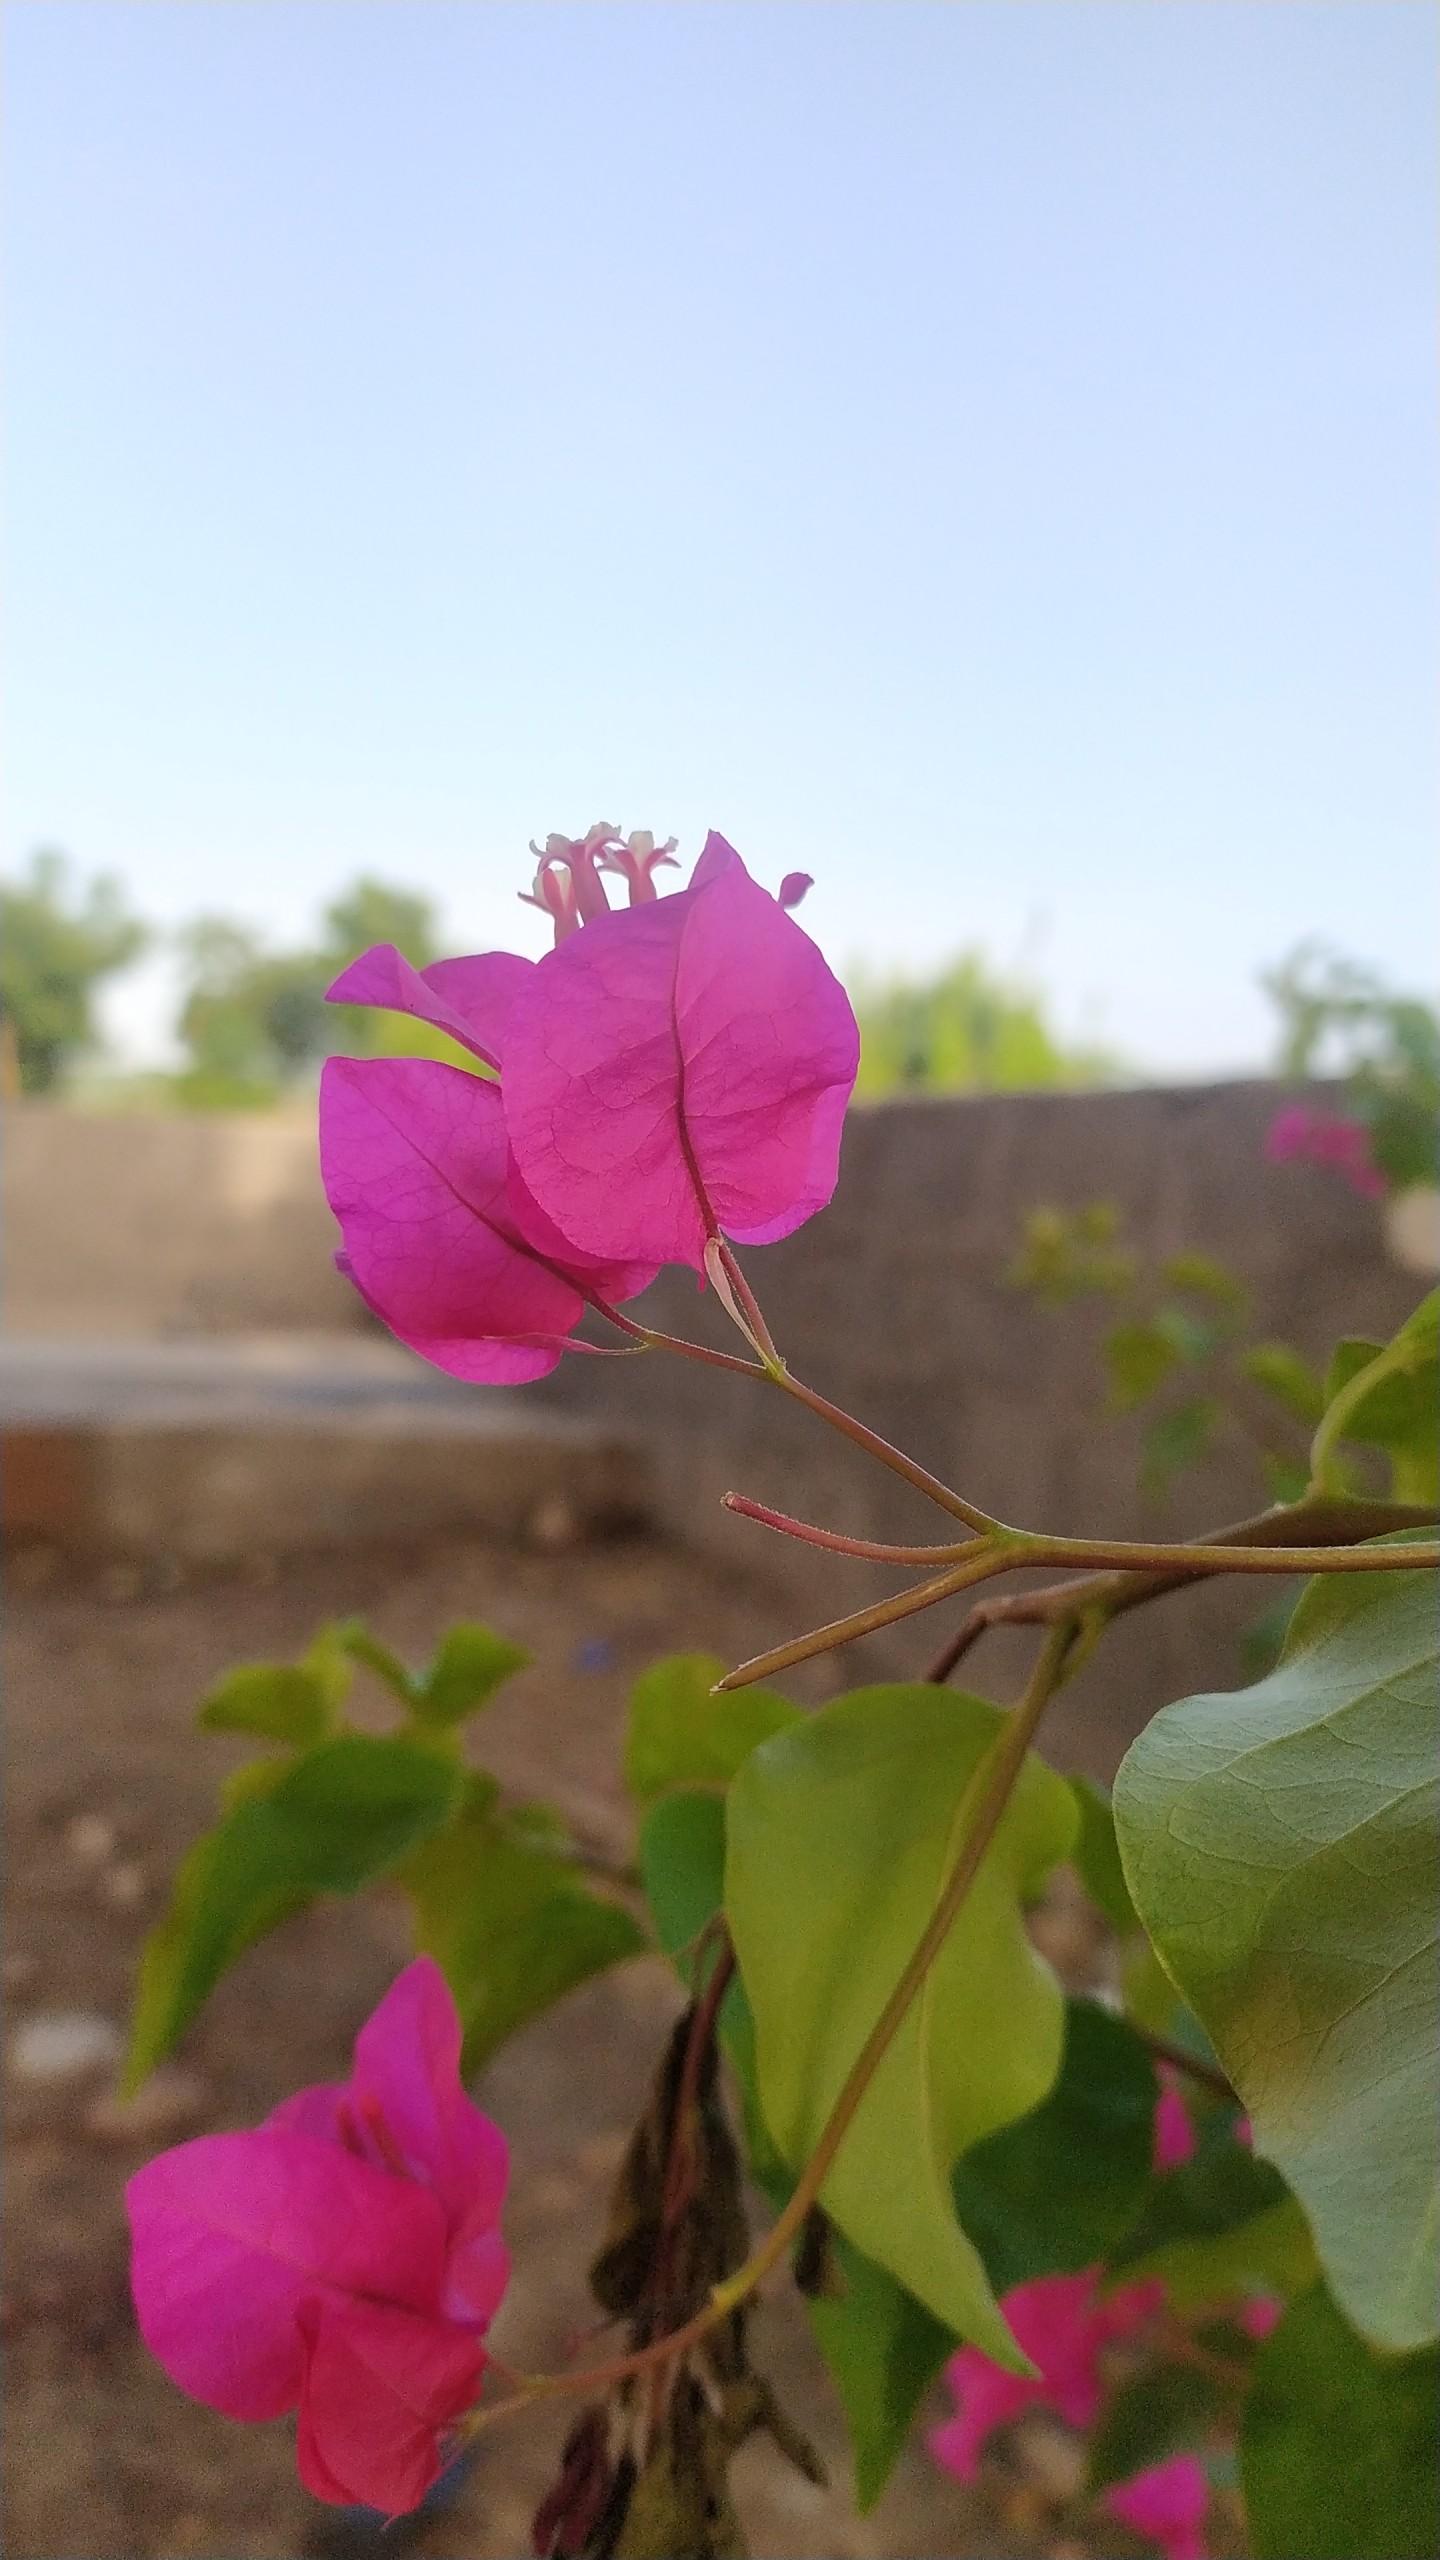 bougainvillea pink flower plant